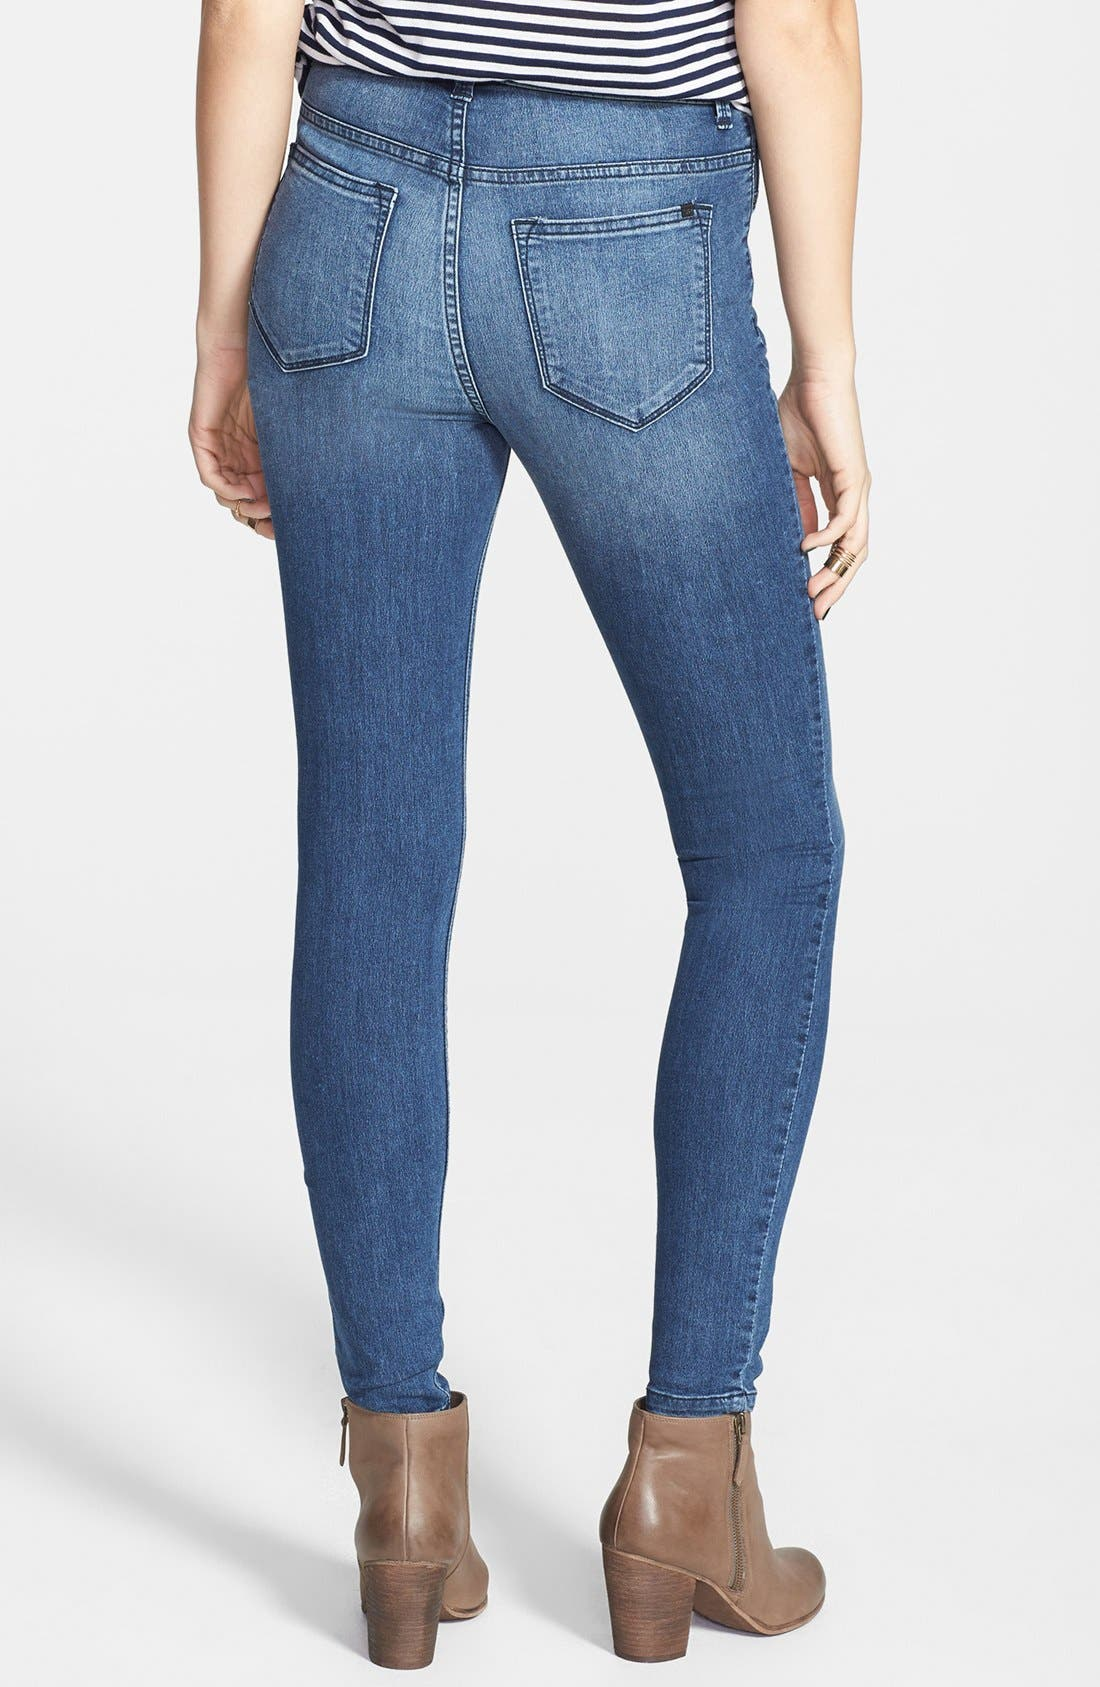 Alternate Image 2  - SP Black High Waist Skinny Jeans (Medium Wash) (Juniors) (Online Only)